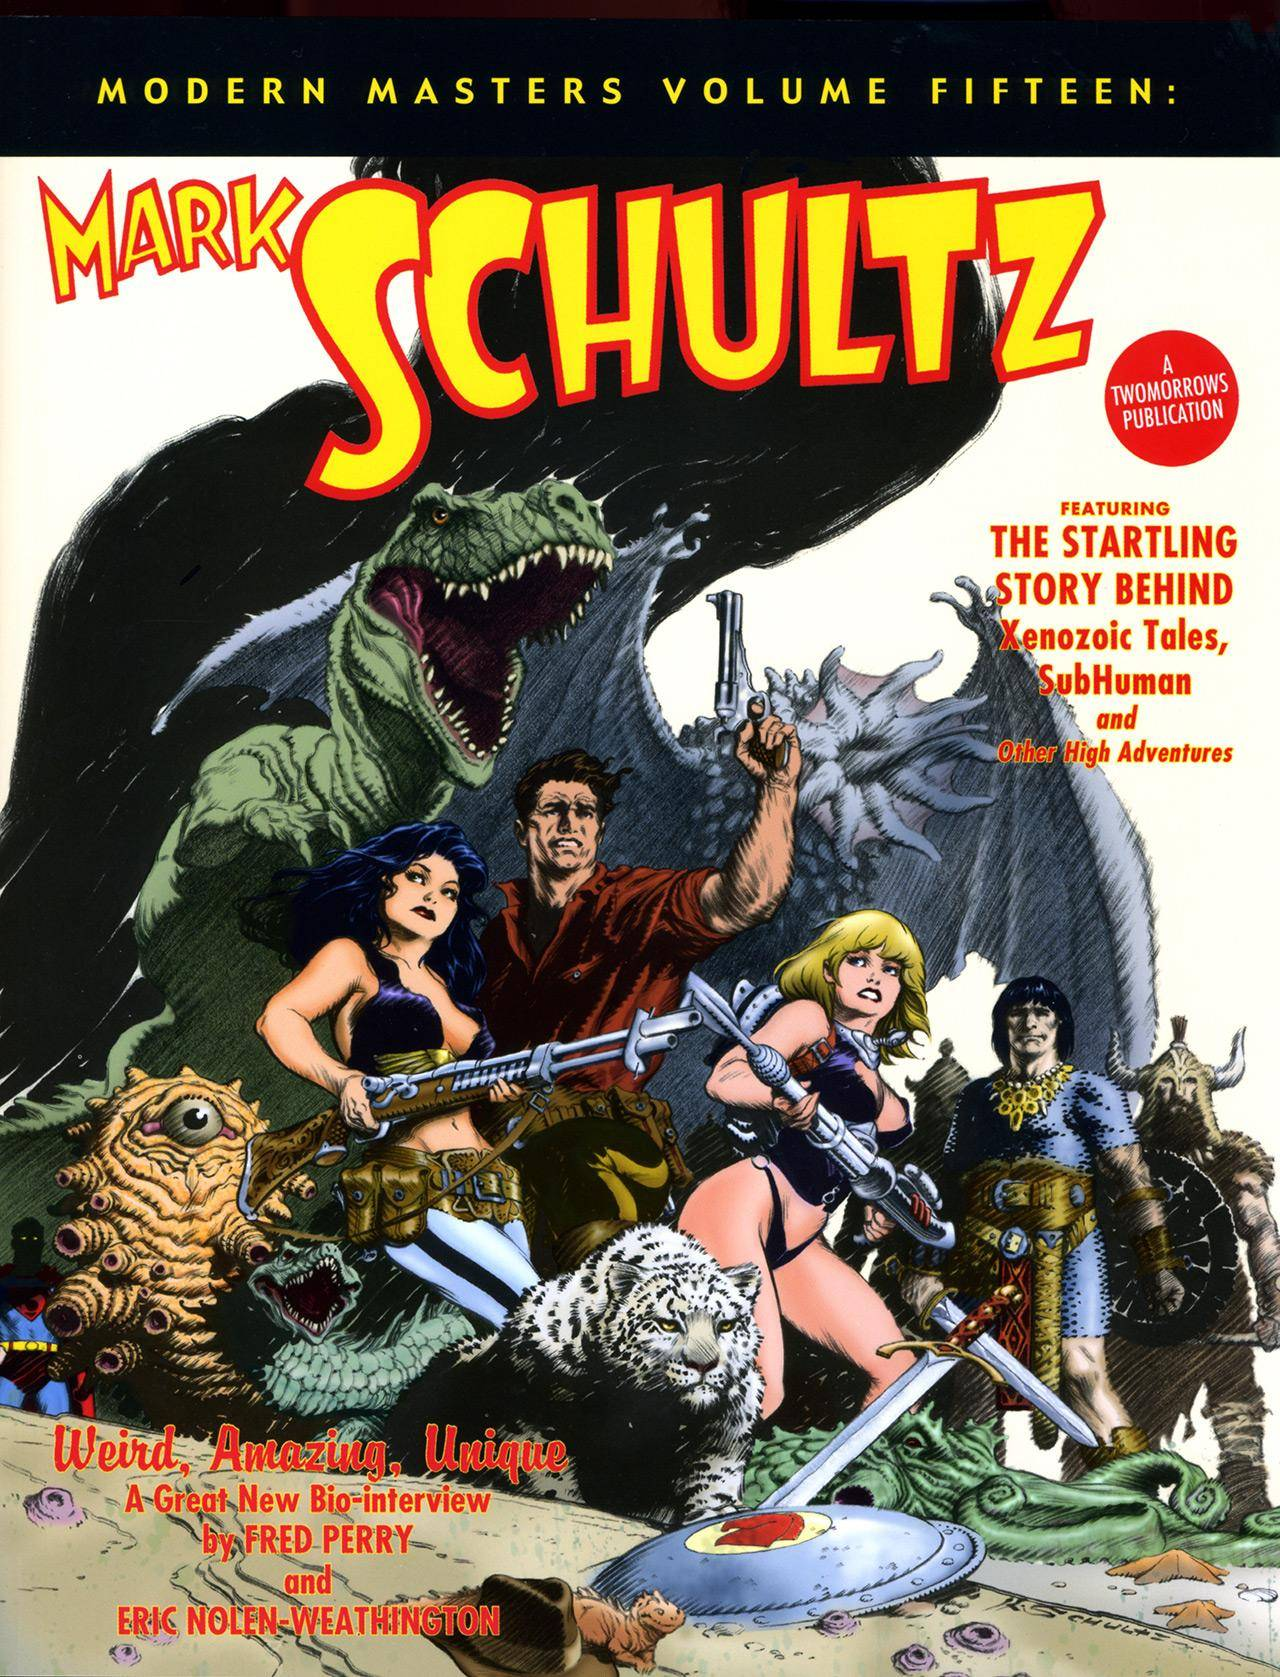 Modern Masters Vol 15 - Mark Schultz ArtNet - DCP